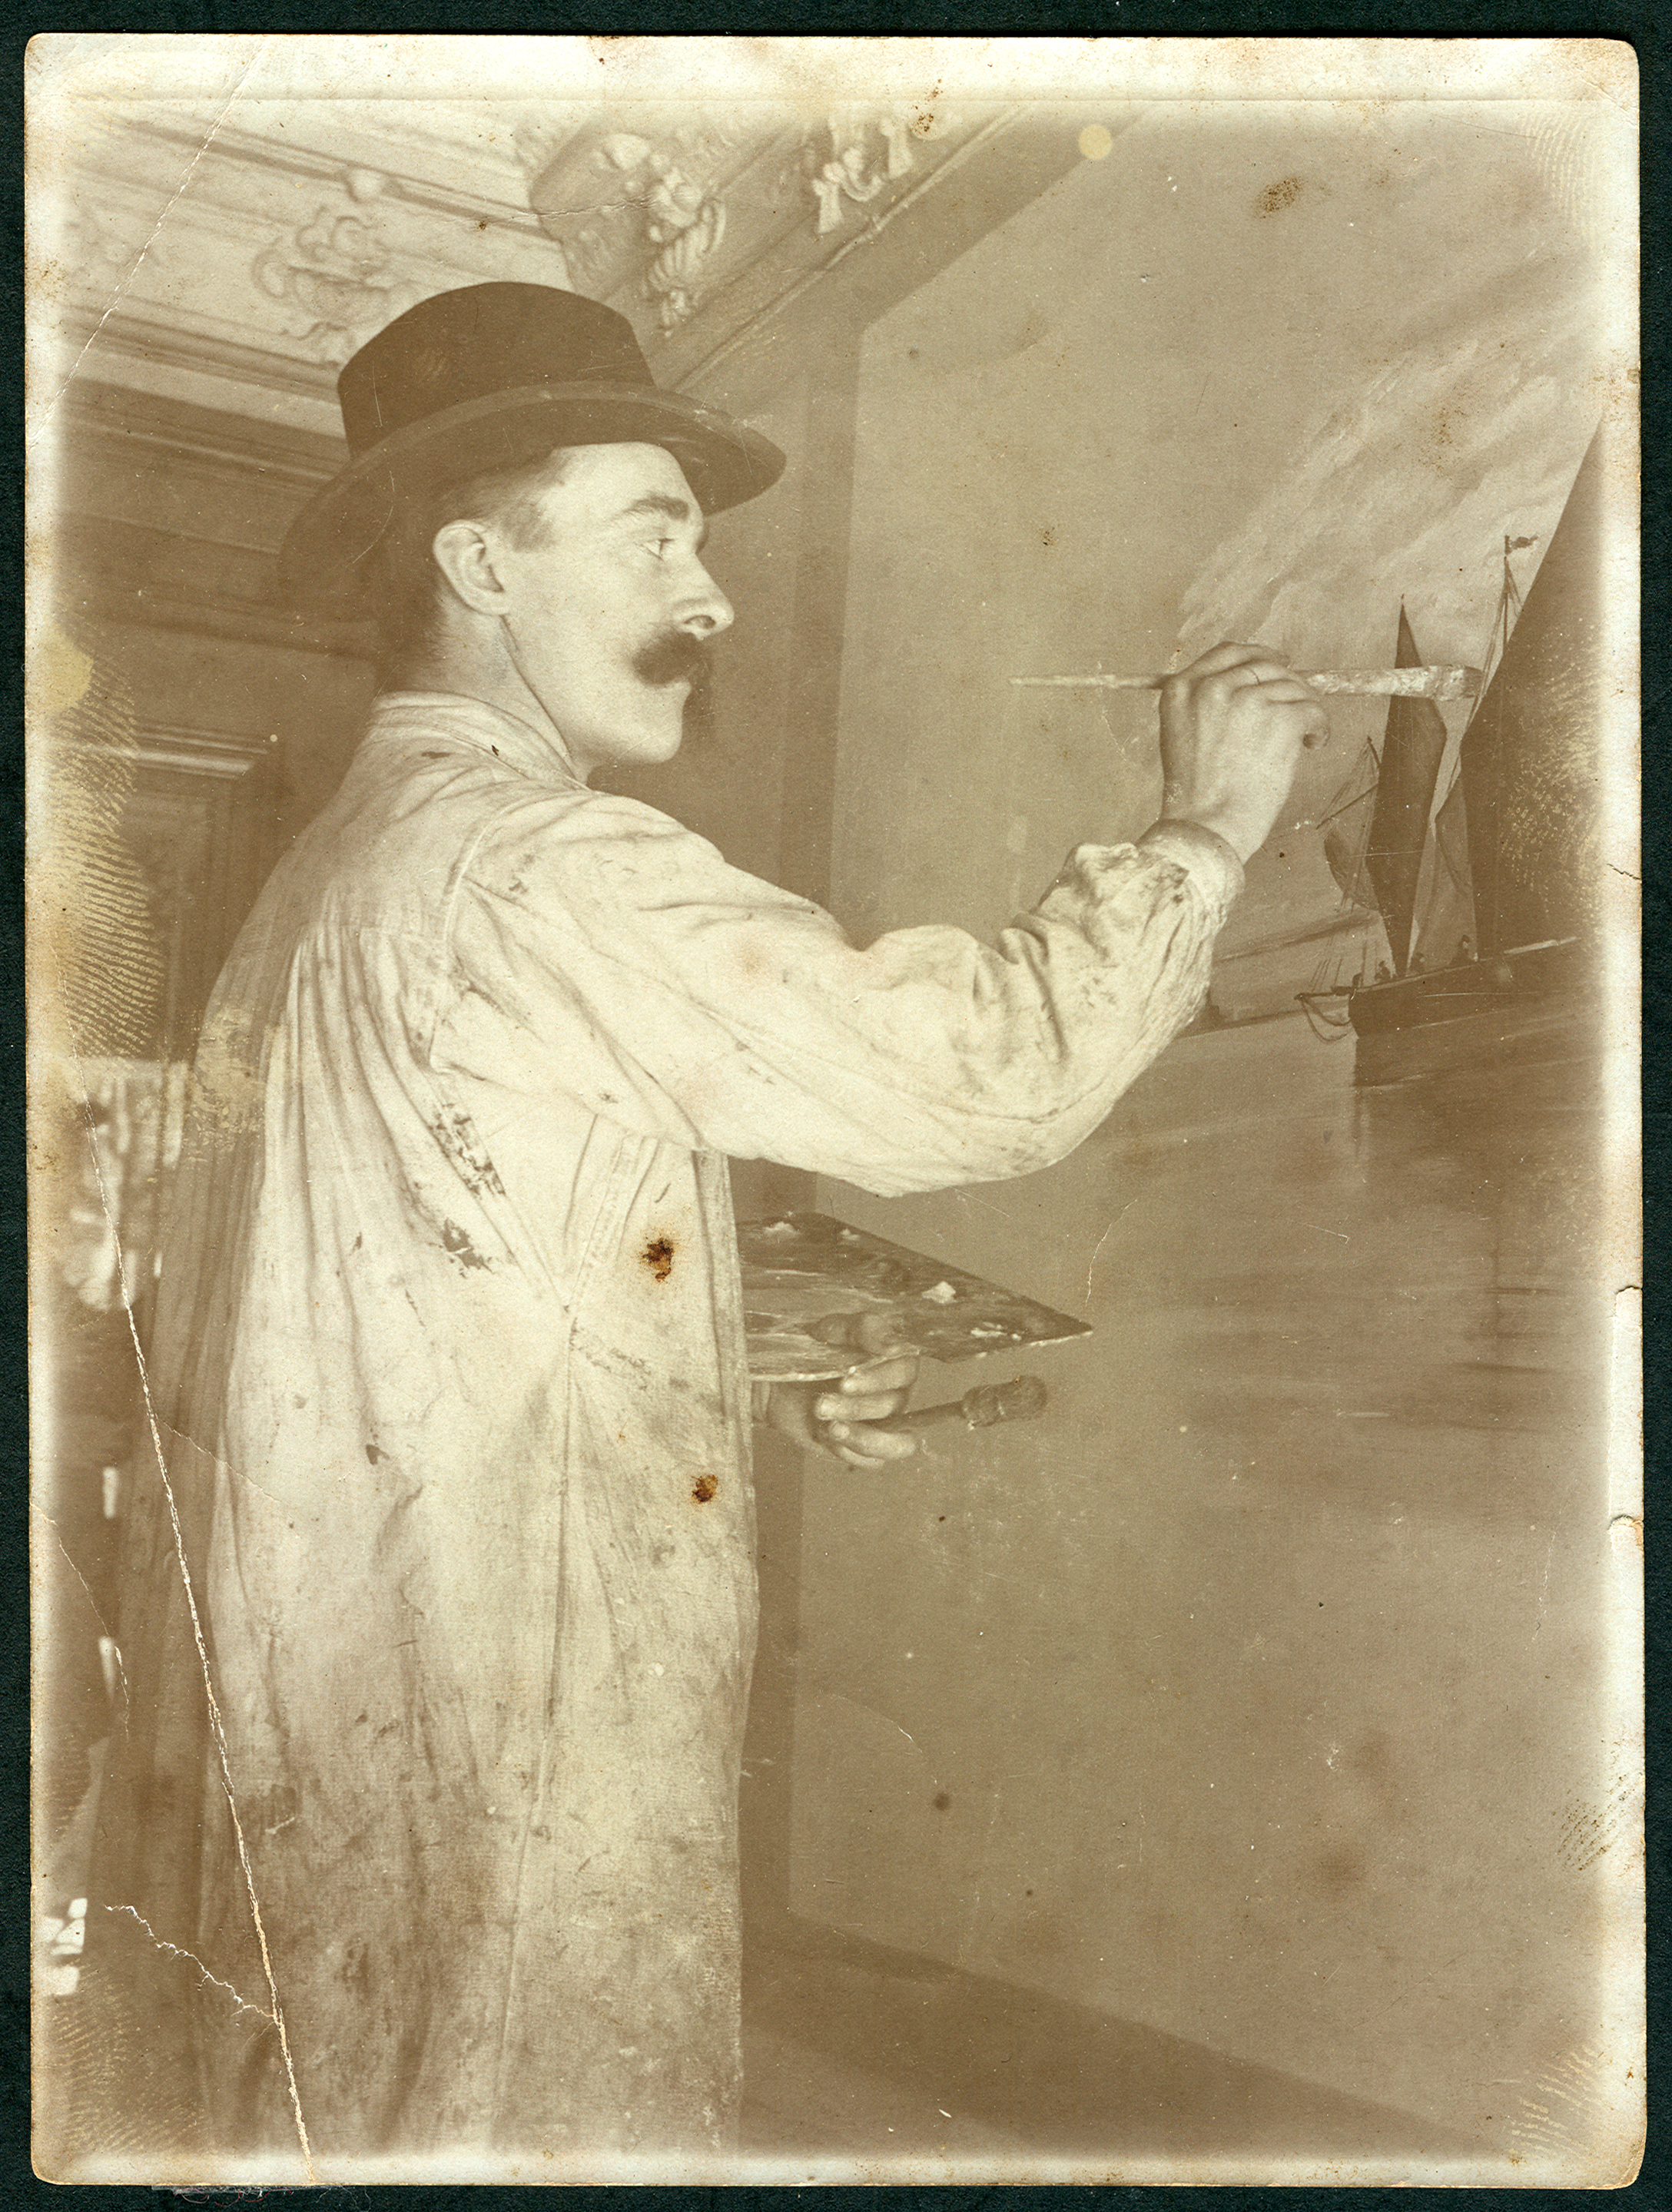 Maler Celle file der maler wilhelm mohrbotter im atelier in celle beim malen